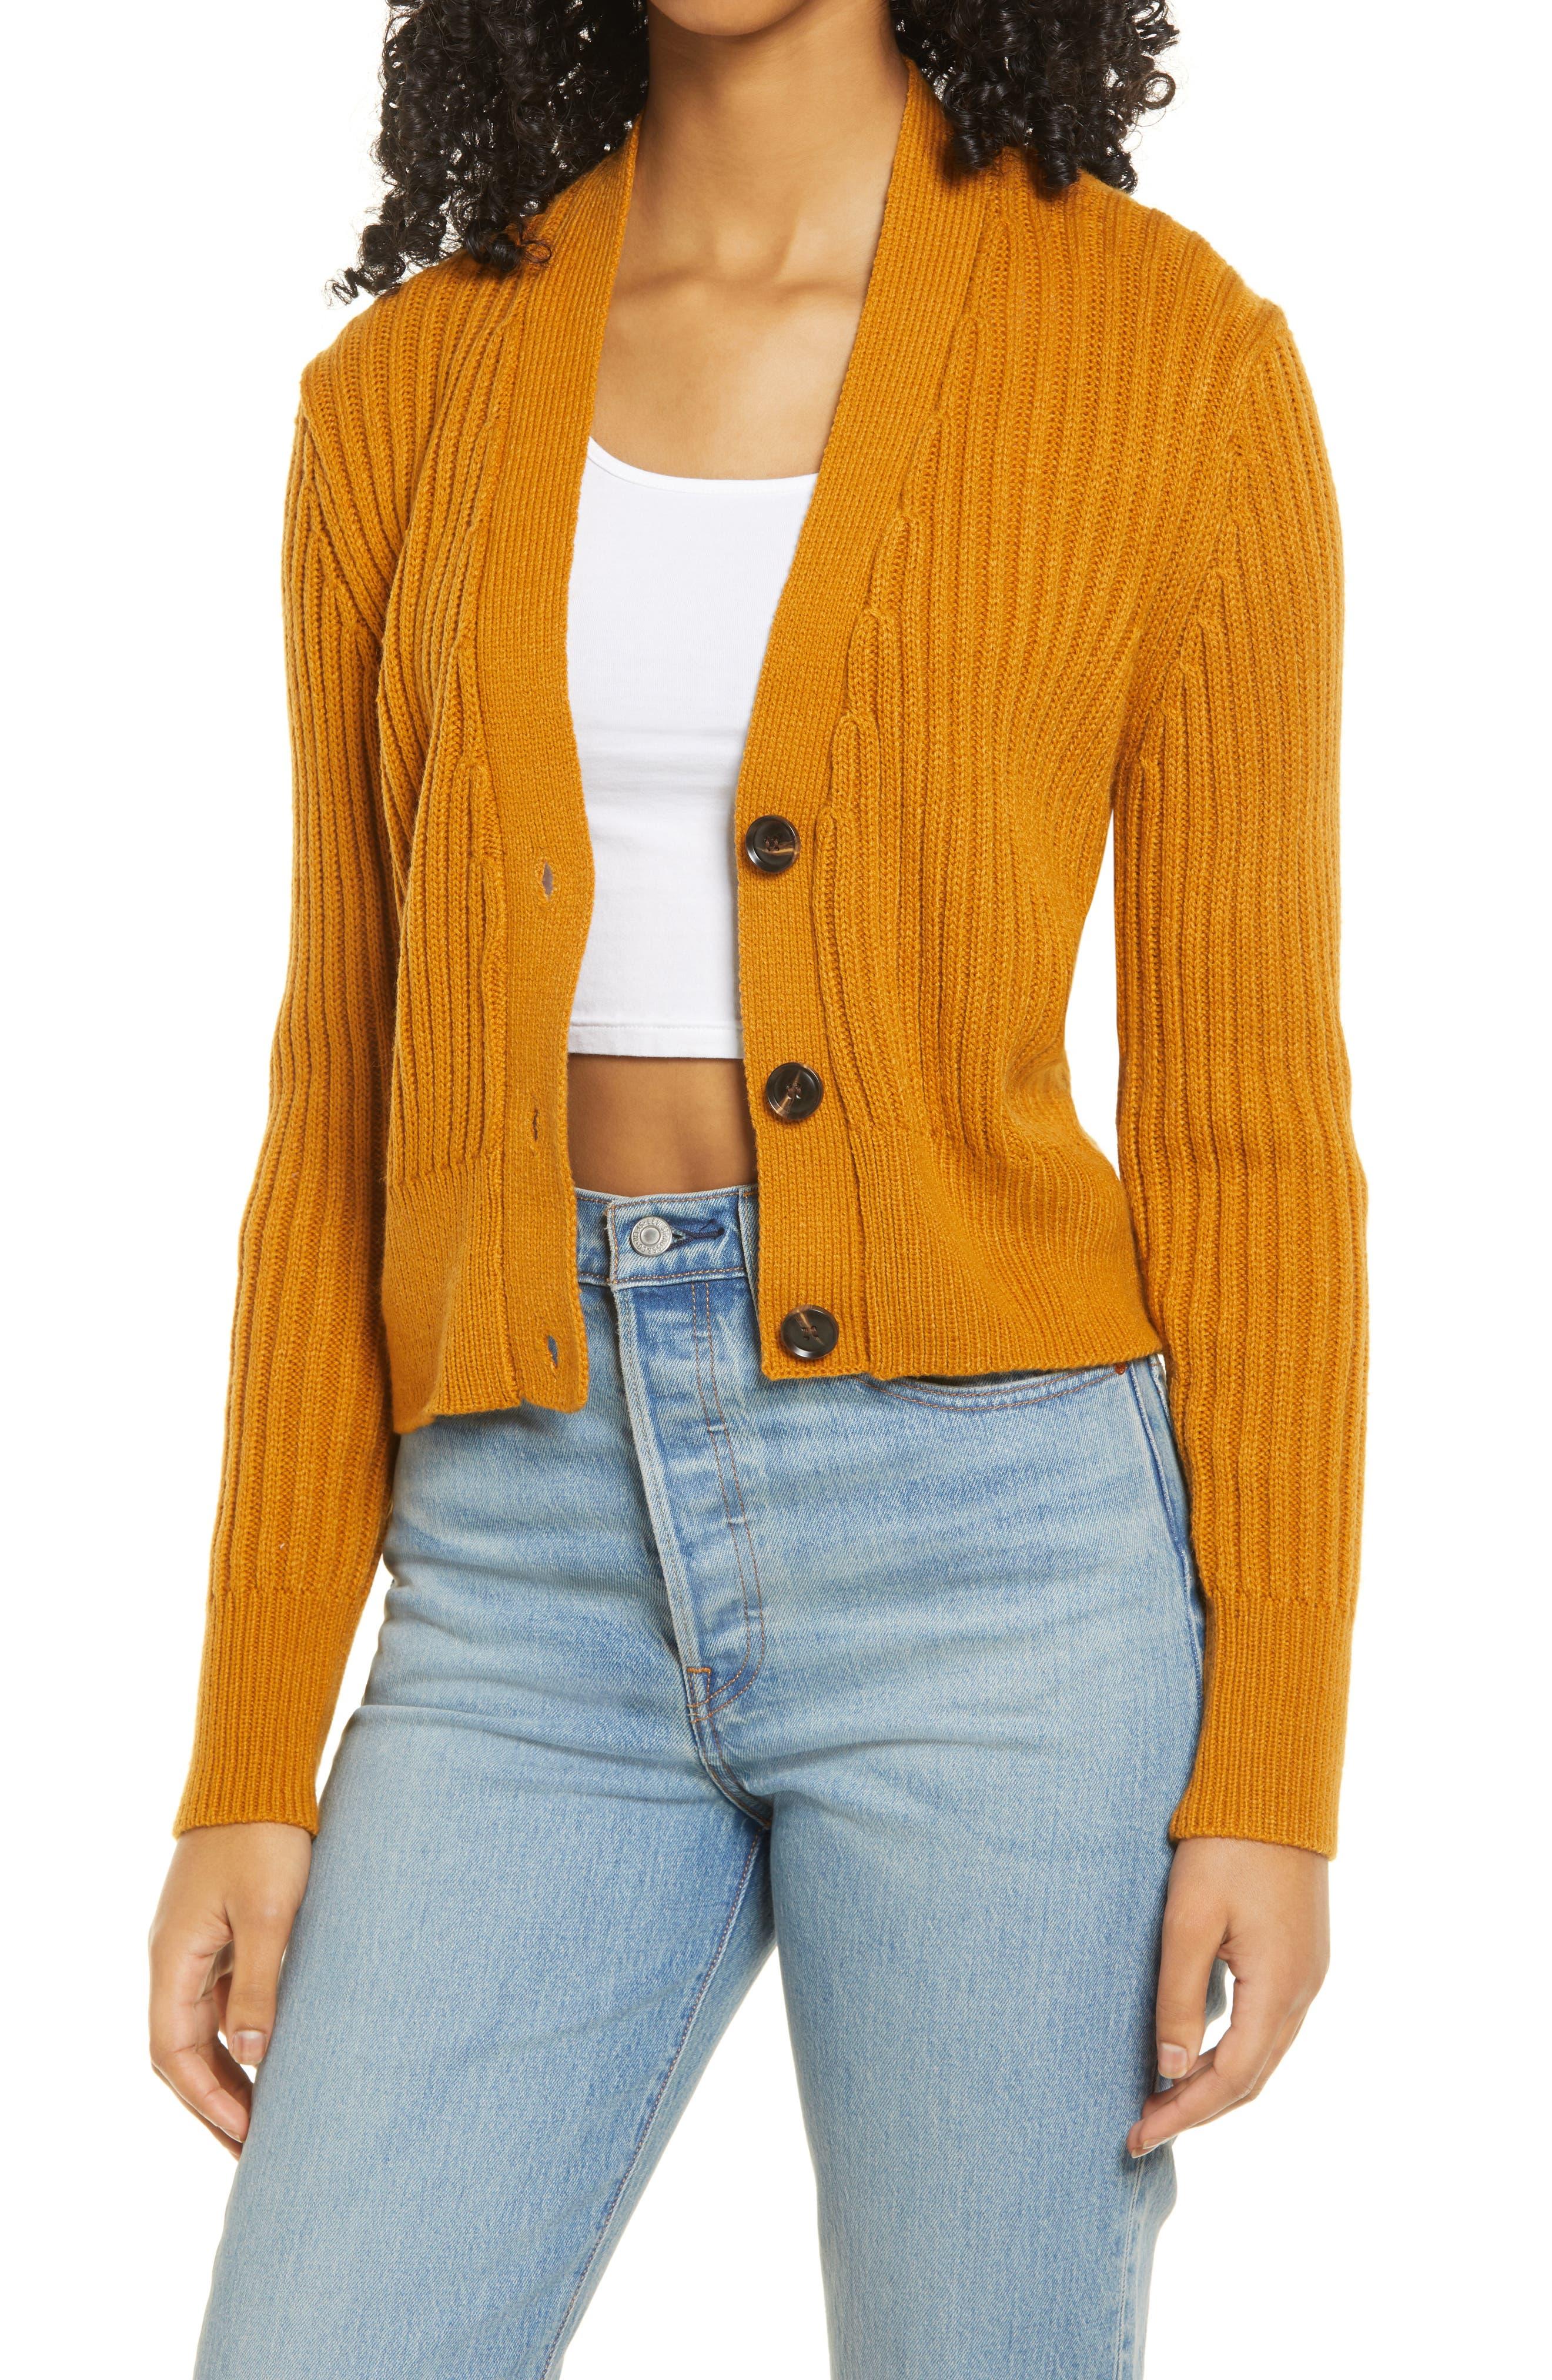 60s Shirts, T-shirts, Blouses, Hippie Shirts Womens Lulus Rib Crop Cardigan Size X-Large - Brown $52.00 AT vintagedancer.com